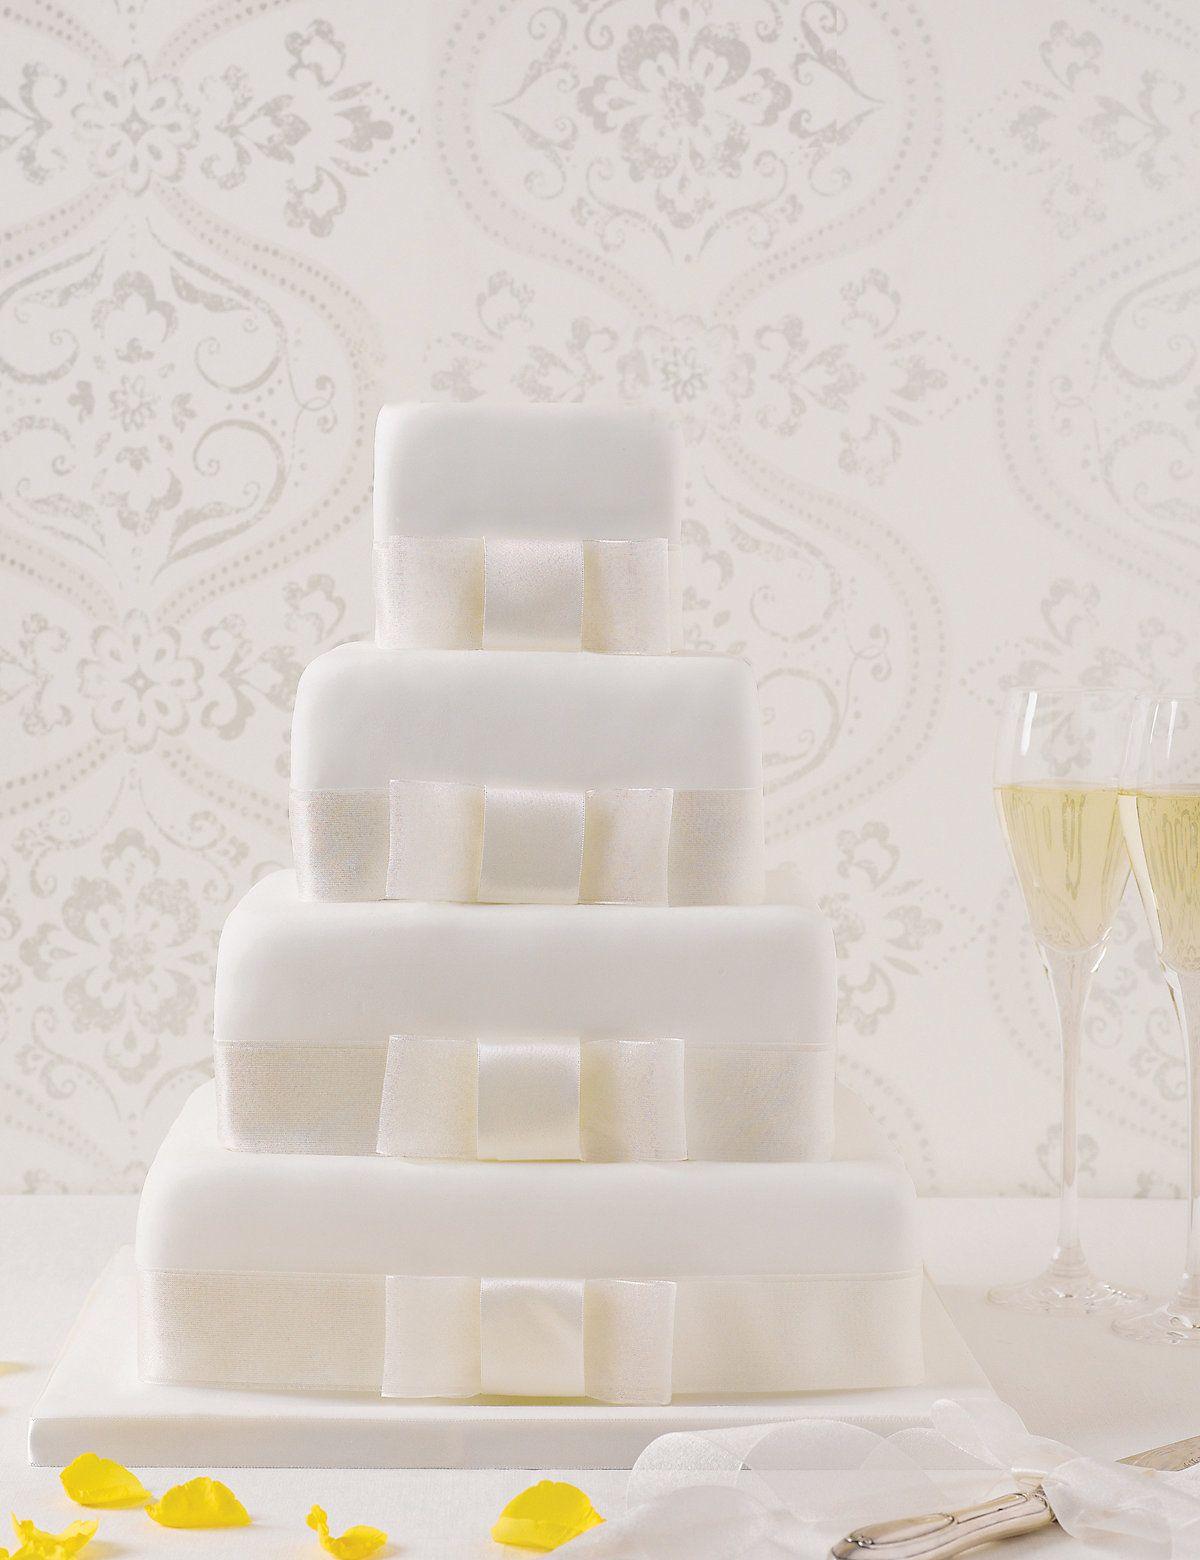 4 Tier Elegant Lemon Wedding Cake   M&S   Mexican cakes   Pinterest ...